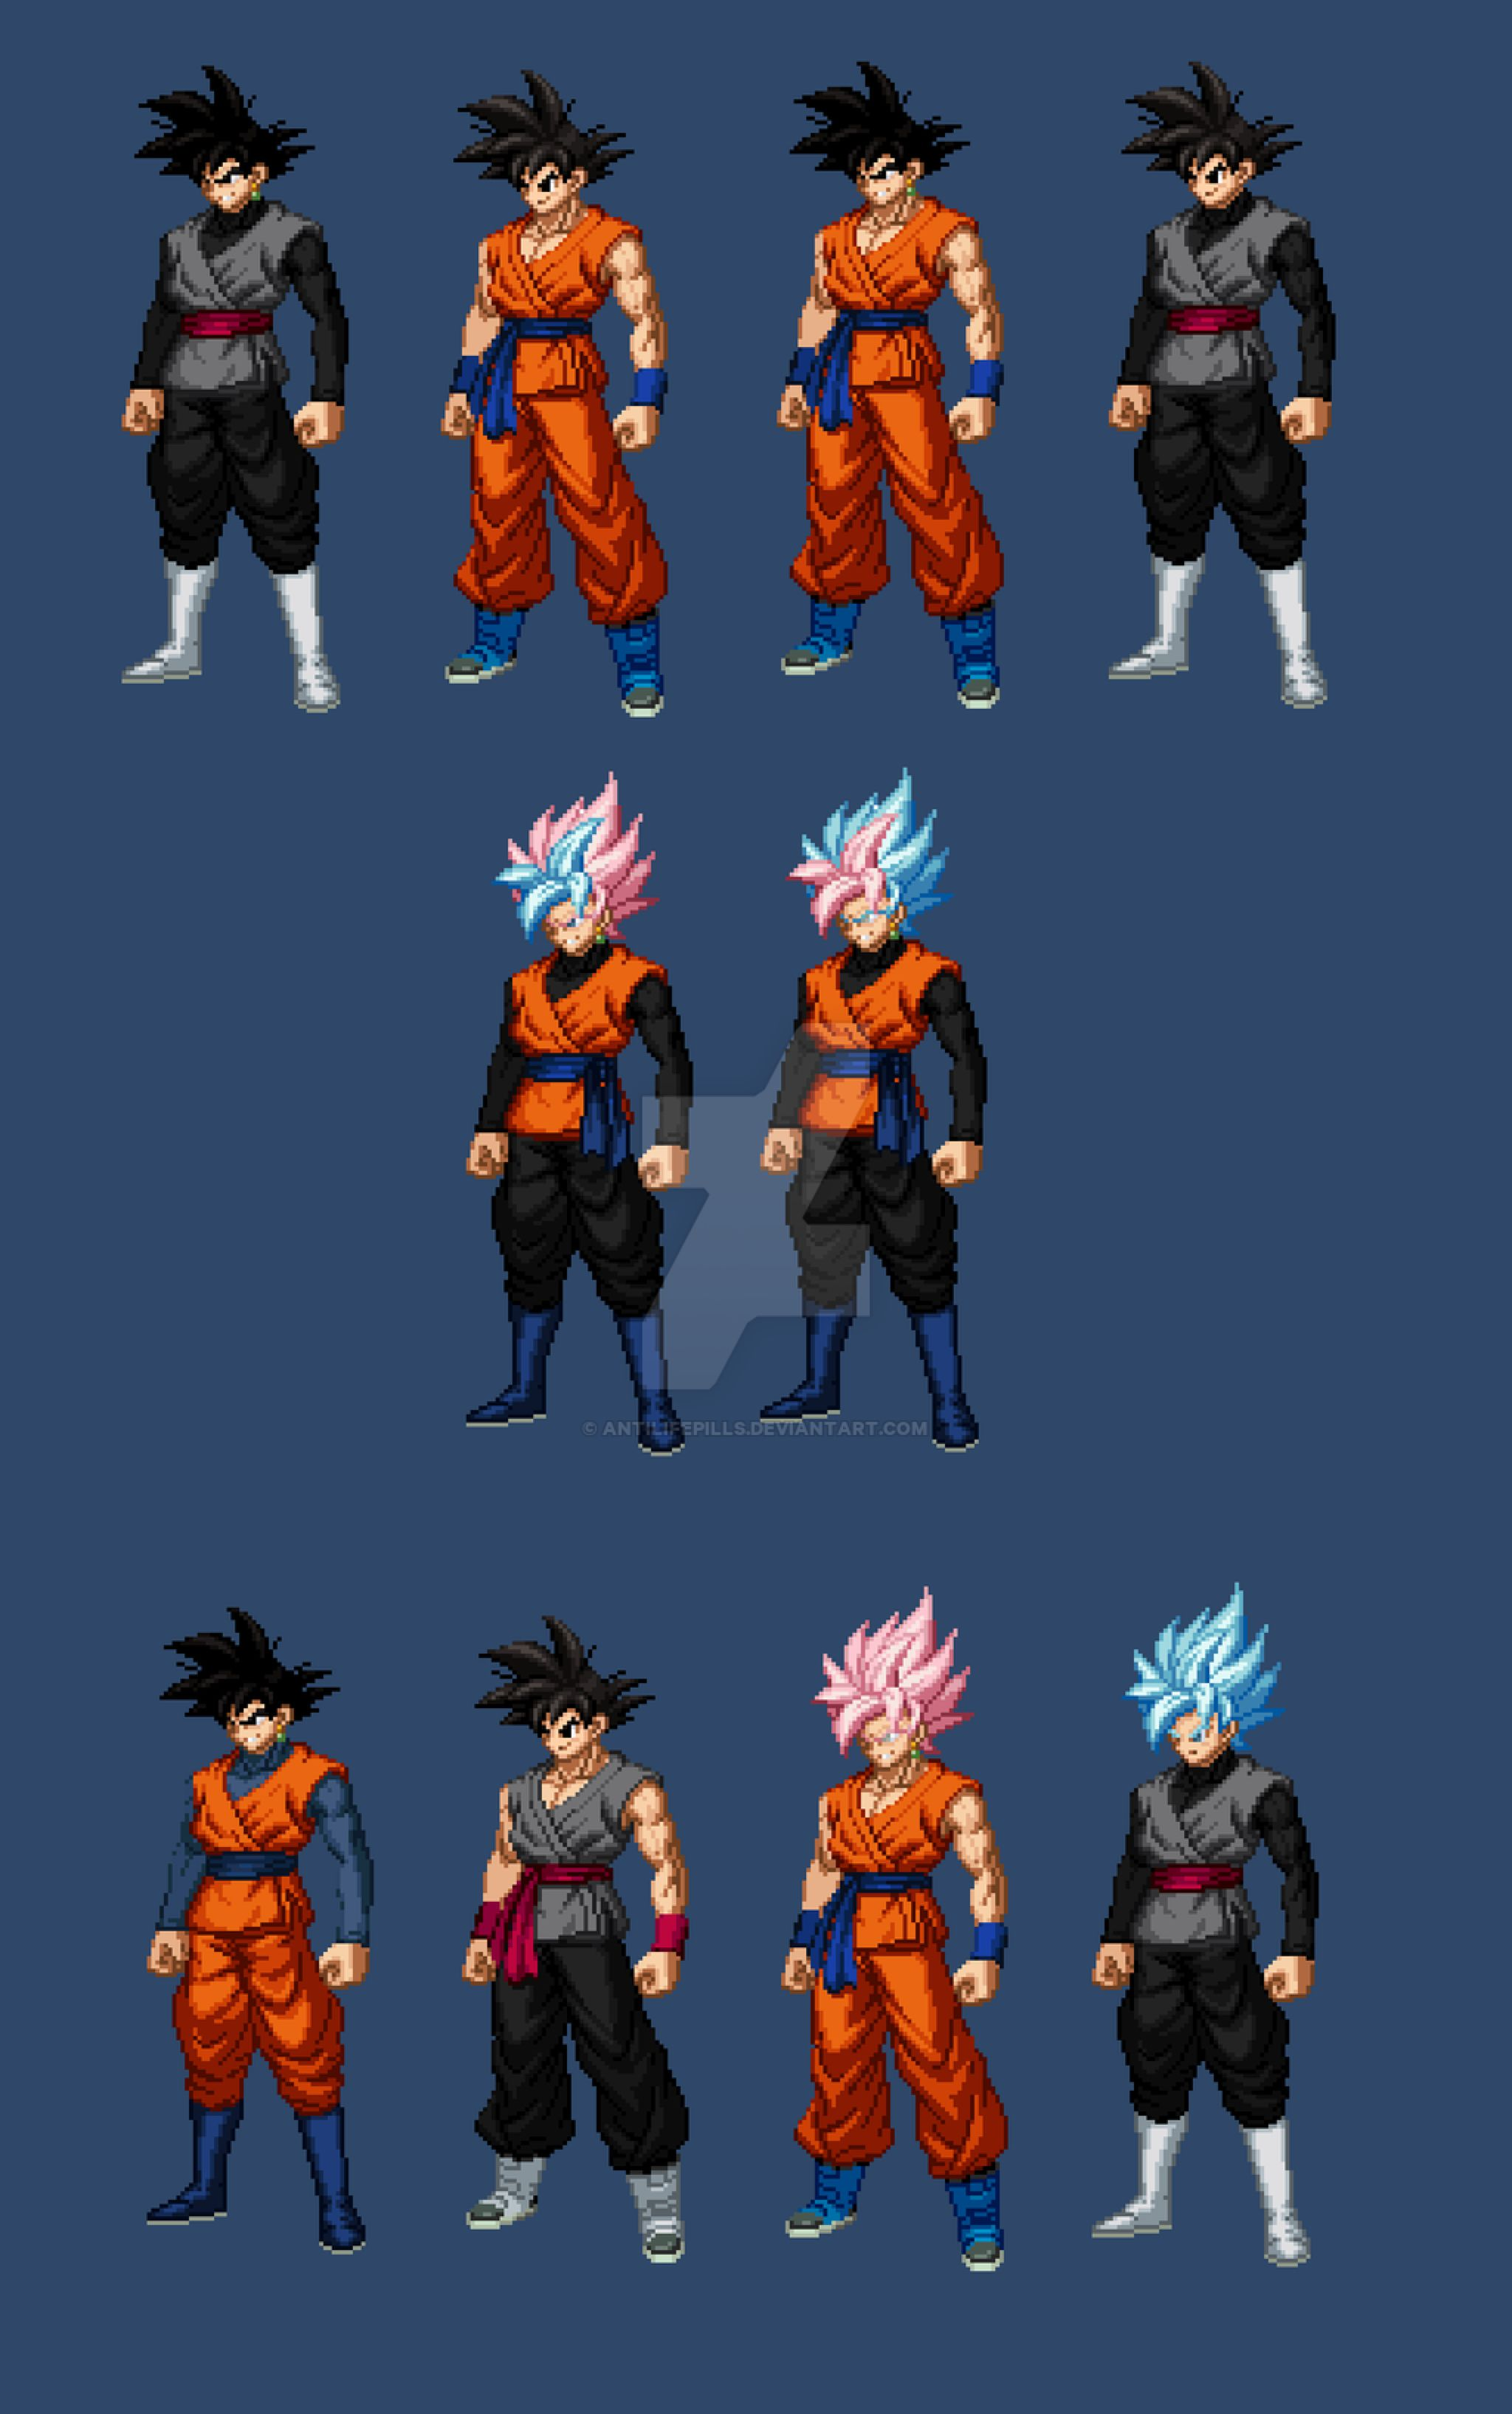 Goku And Goku Black Extreme Butoden By Antilifepills On